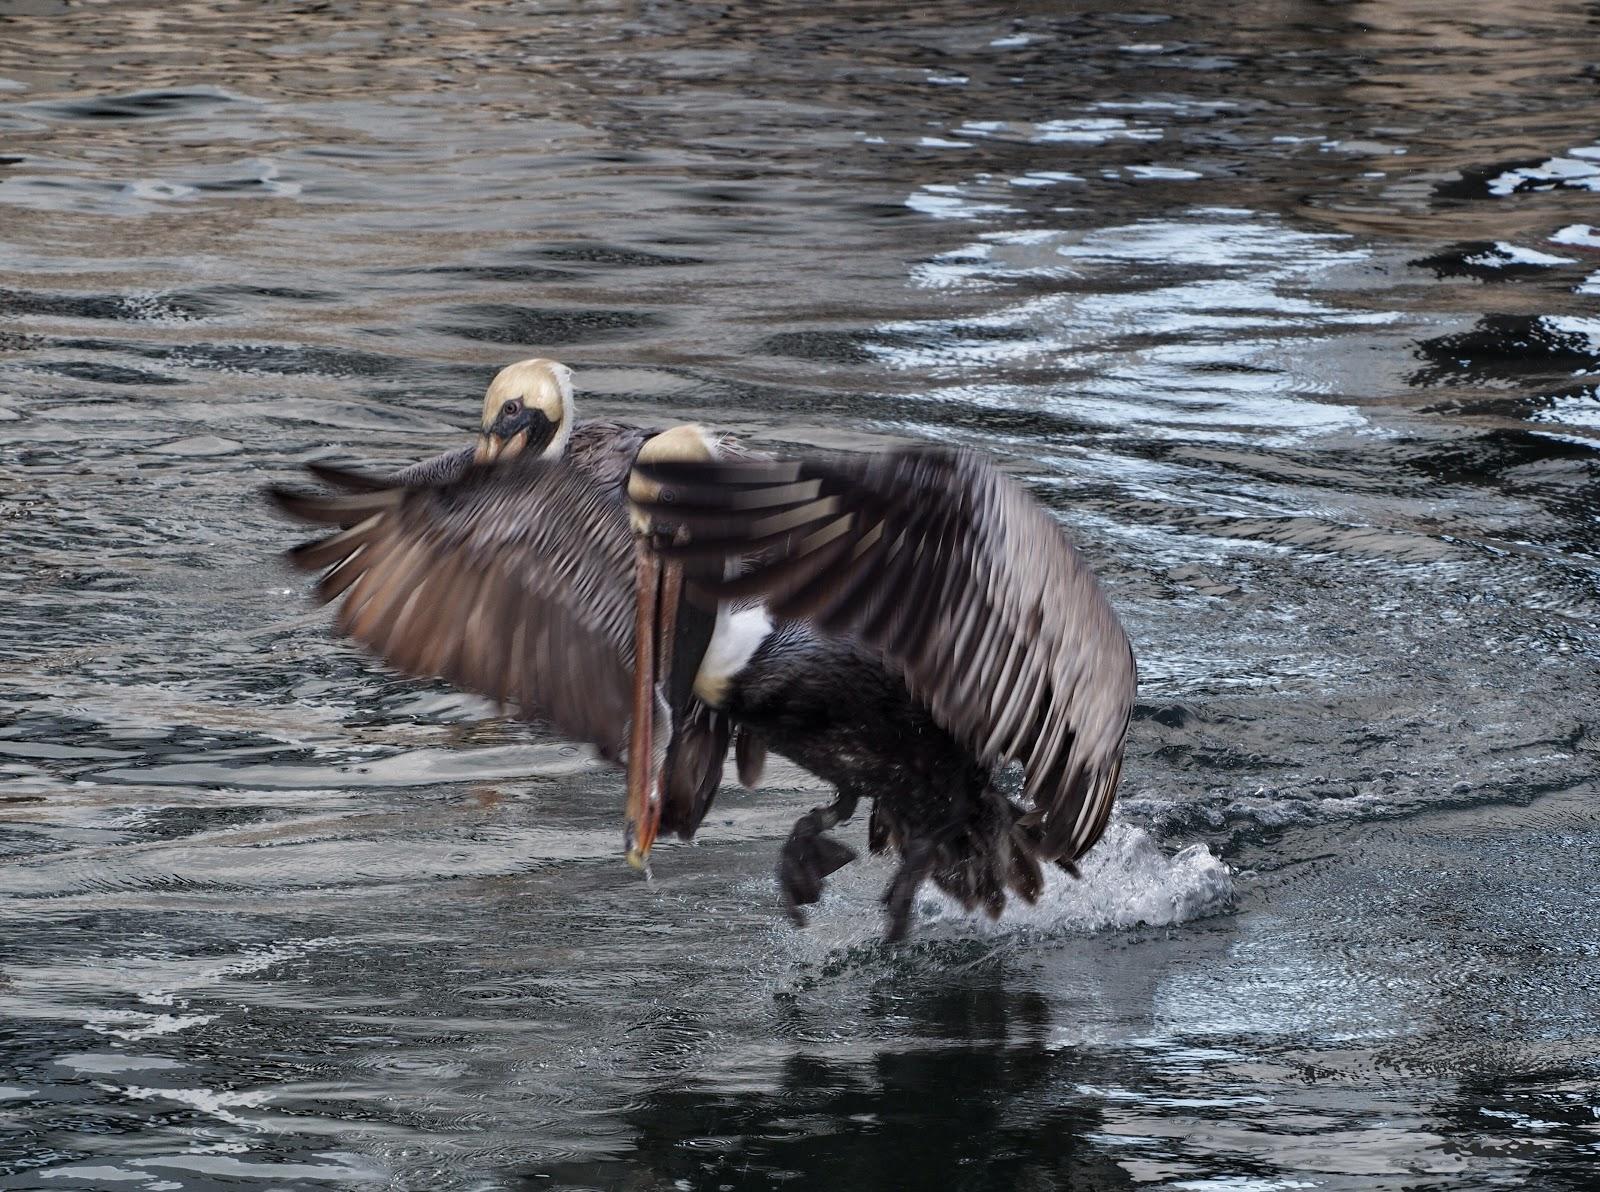 Landing, #pelican #pelicans #keywest #florida 2014